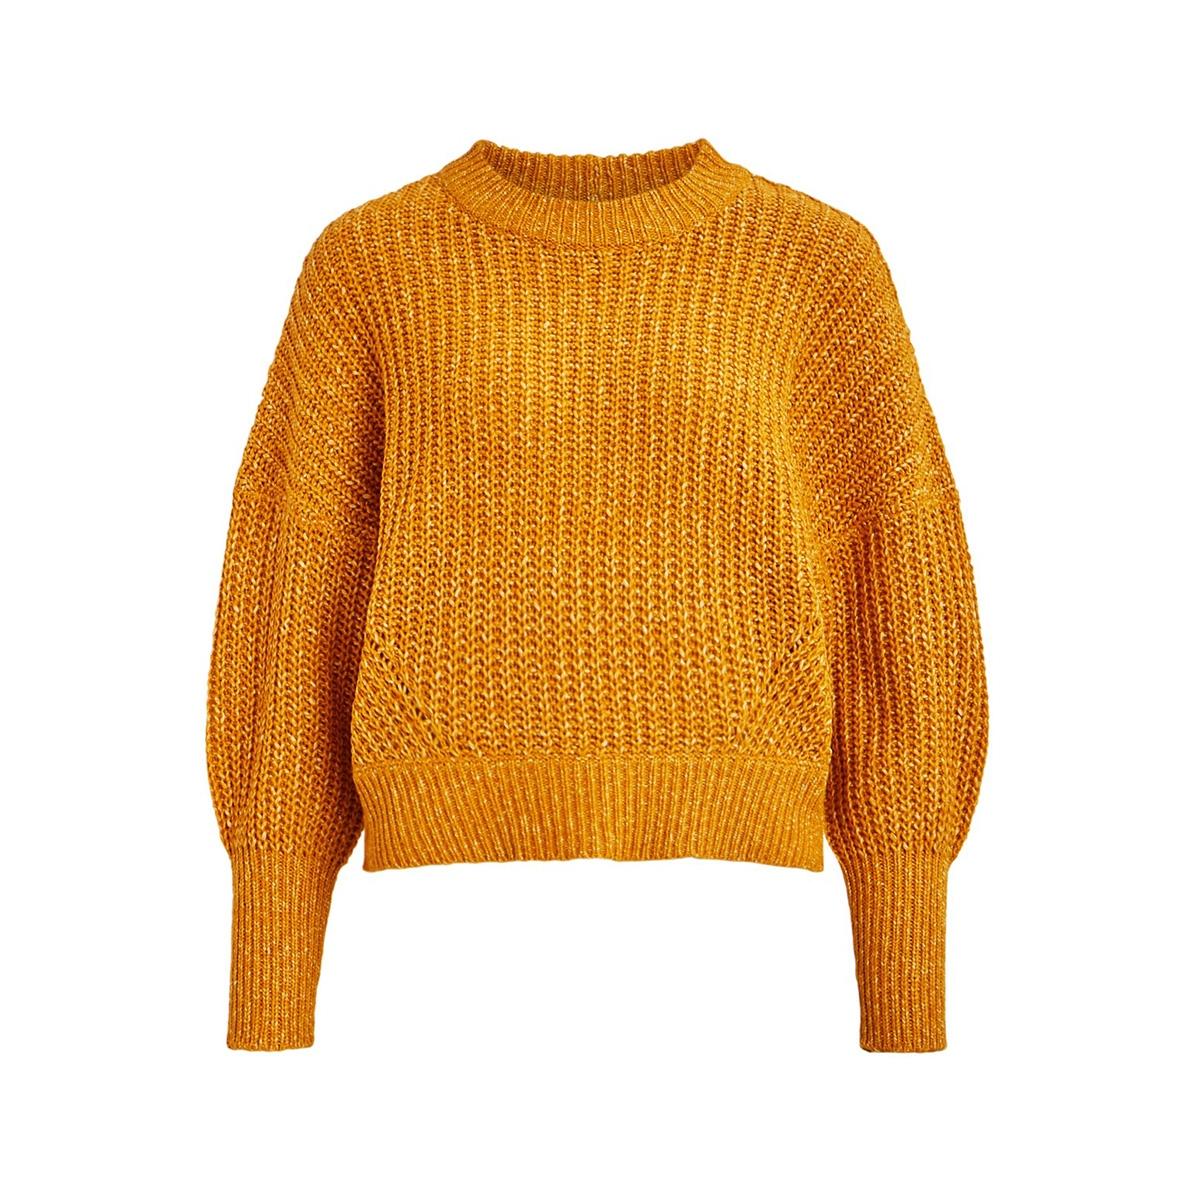 objmelody camper l/s knit pullover 23029953 object trui buckthorn brown/melange